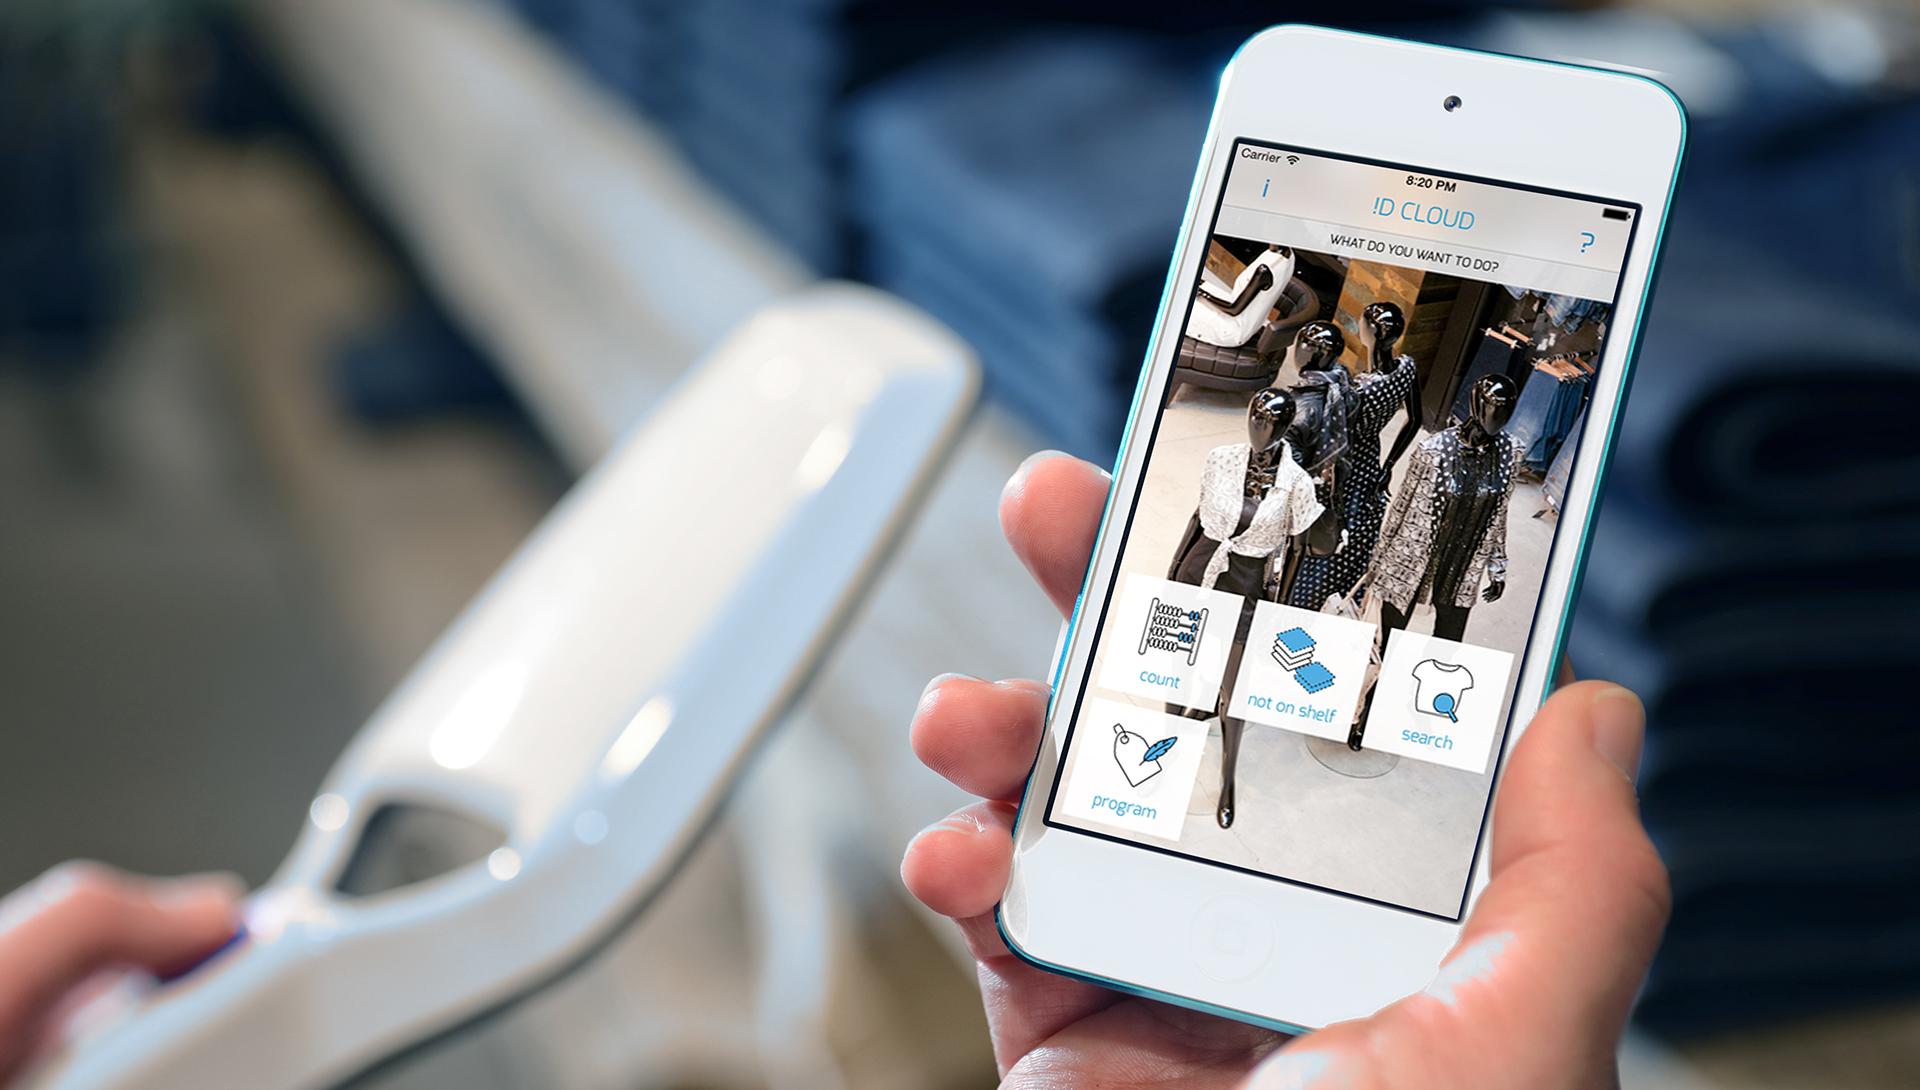 iD Cloud app and handheld